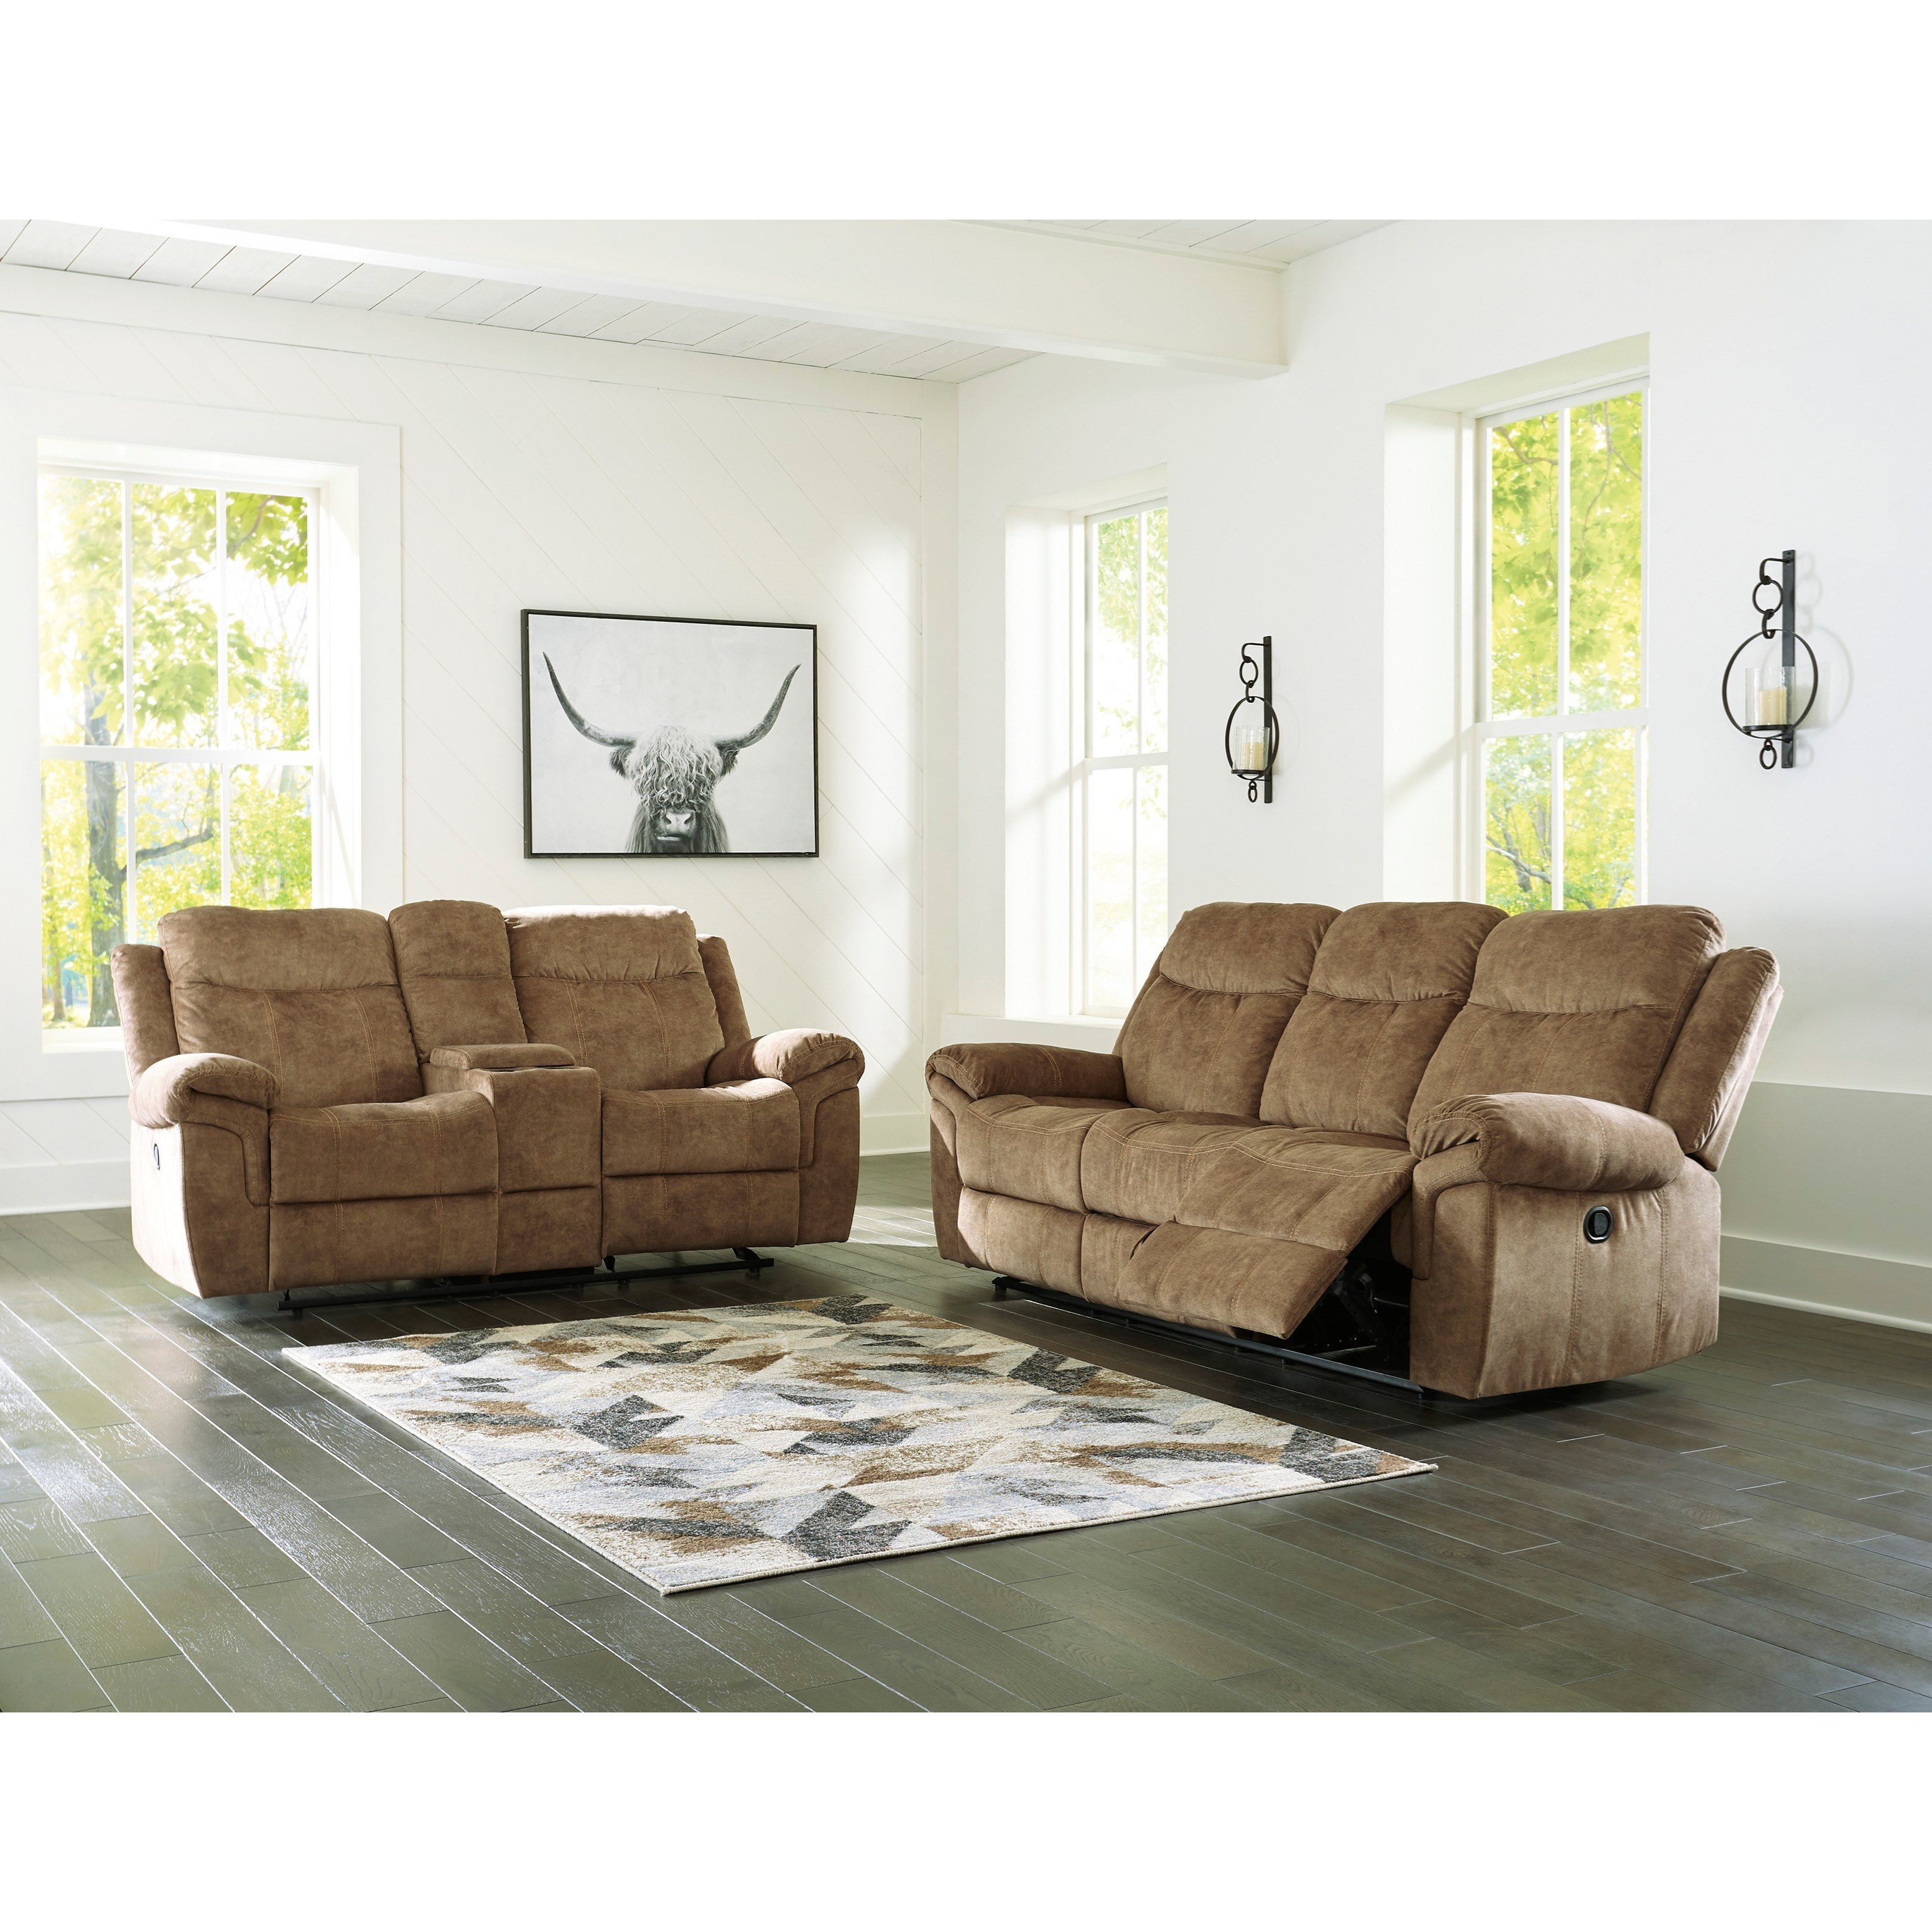 Huddle-Up Reclining Living Room Group by Ashley (Signature Design) at Johnny Janosik